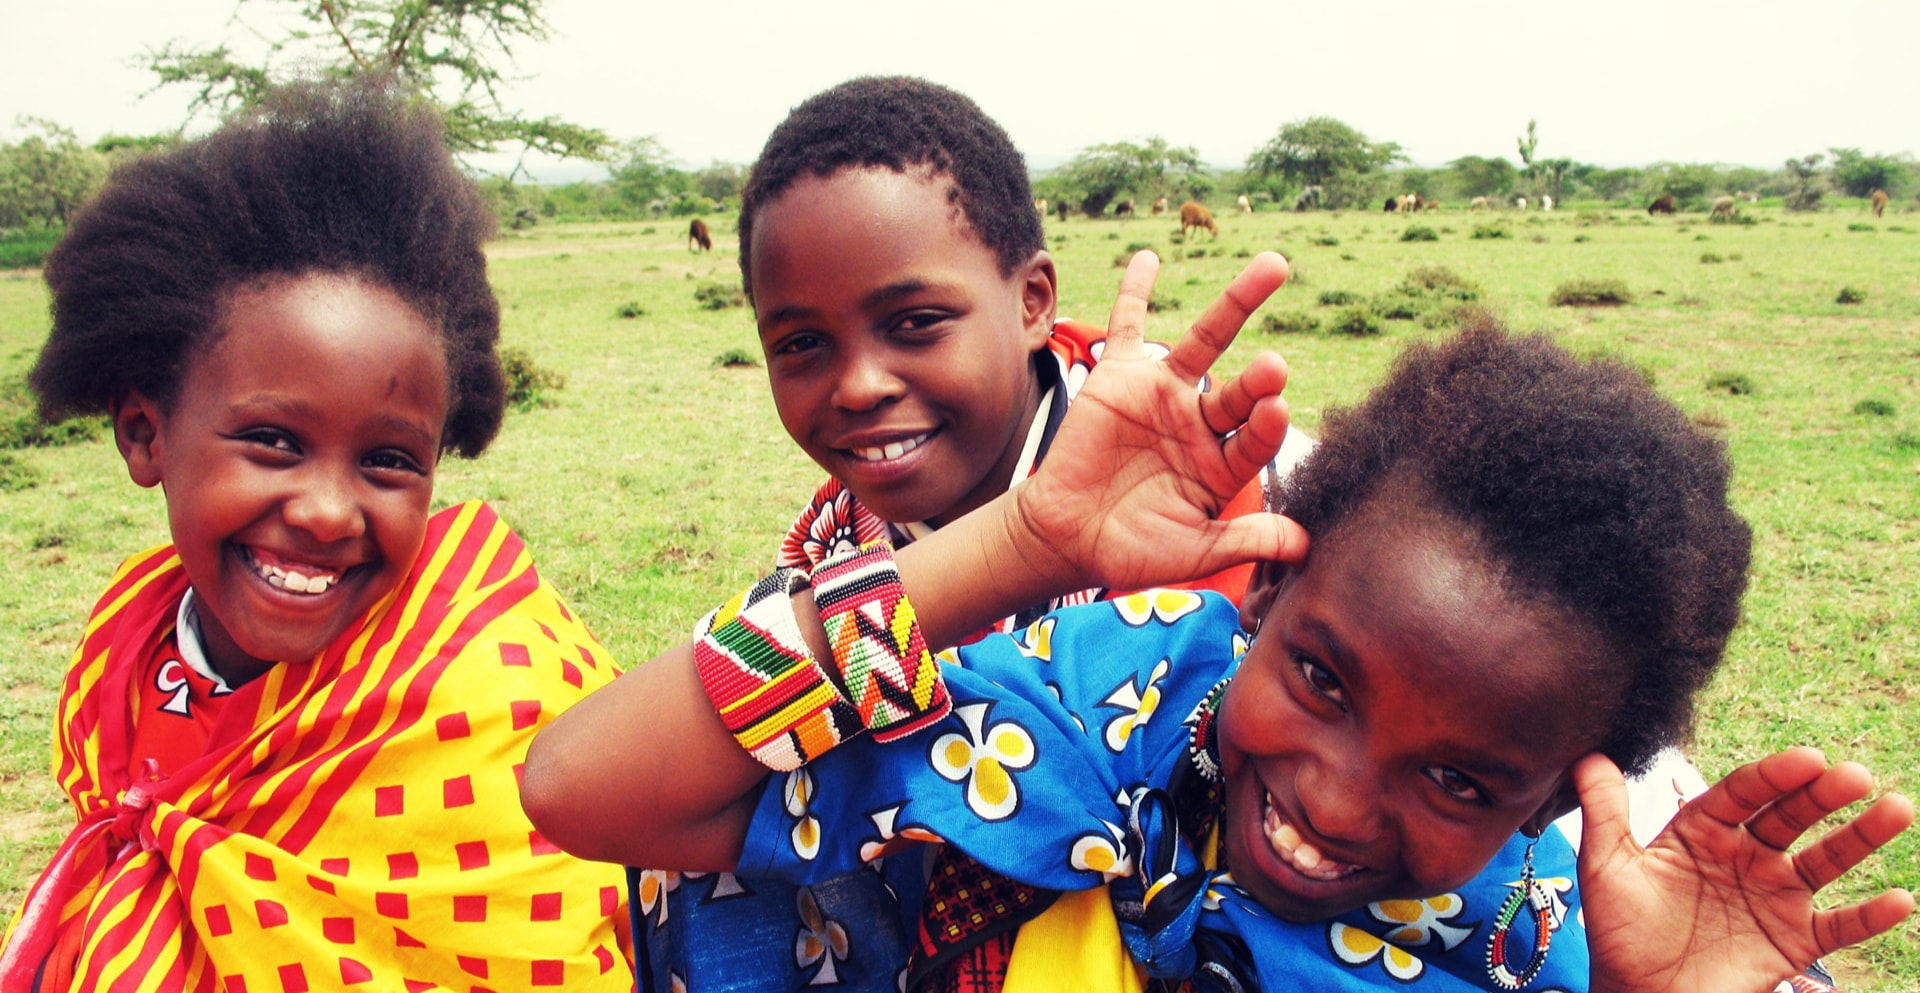 Viaje a Kenia organizado por NUBA y la ONG Wanawake